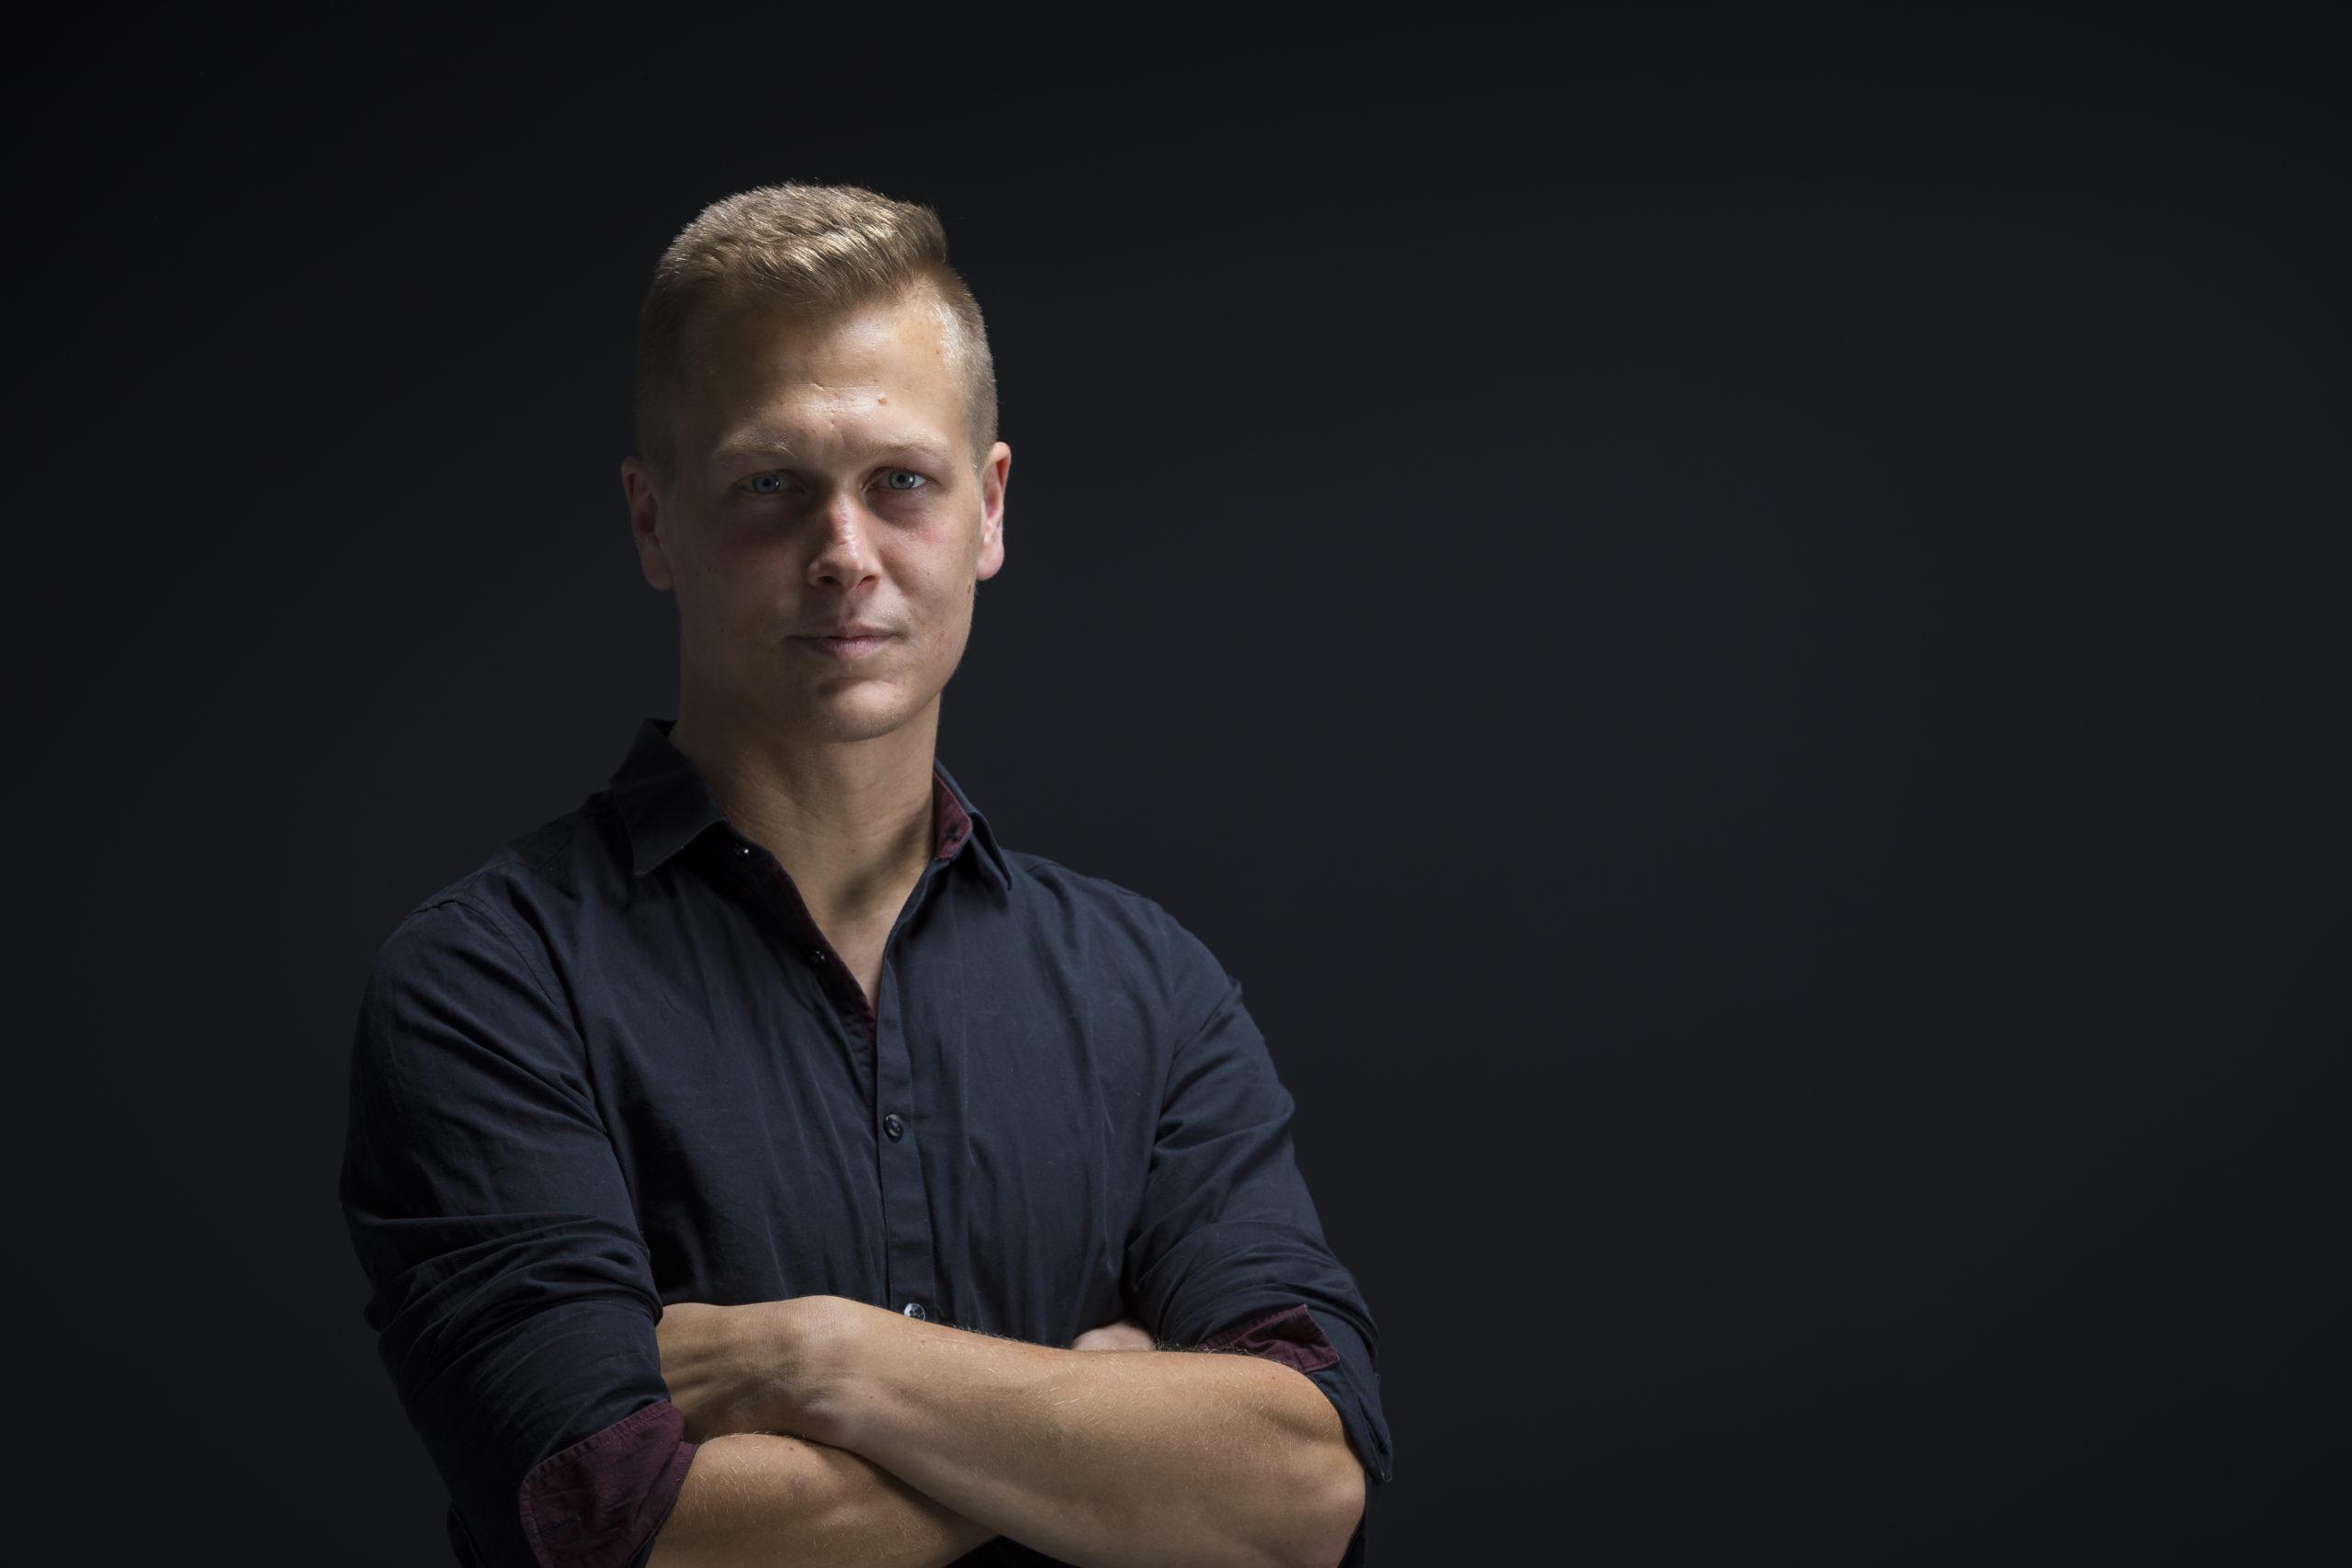 Daniel Volke